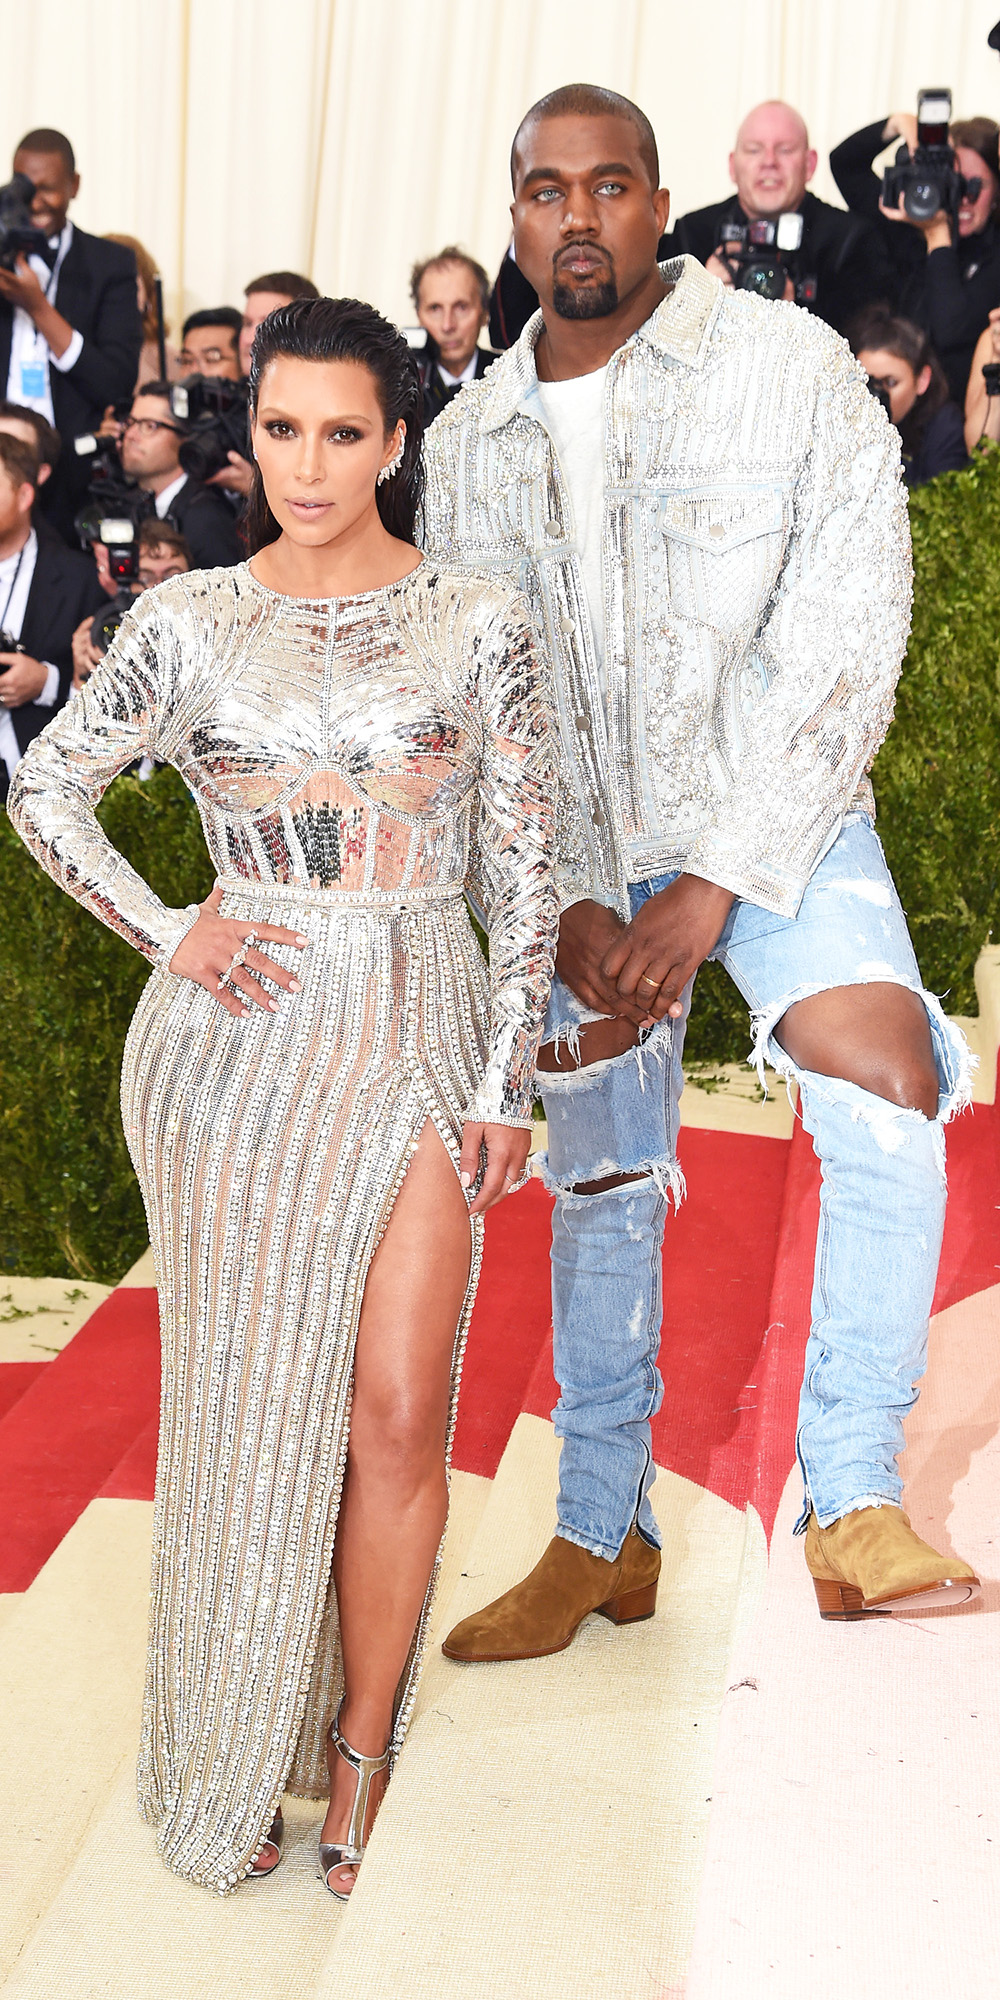 Celebrities Wearing Bling Kim Kardashian Wears a Long Sleeves High Slit Sequin Dress and Open Toe Pumps